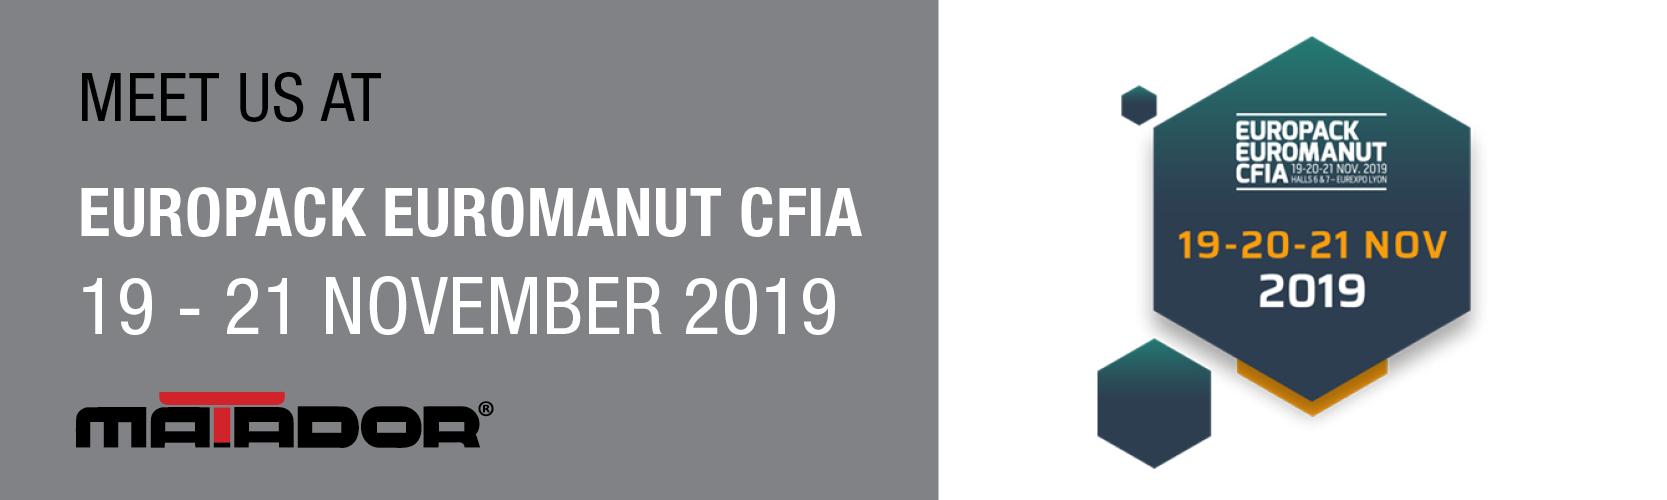 Europack-CFIA-19-11-2019